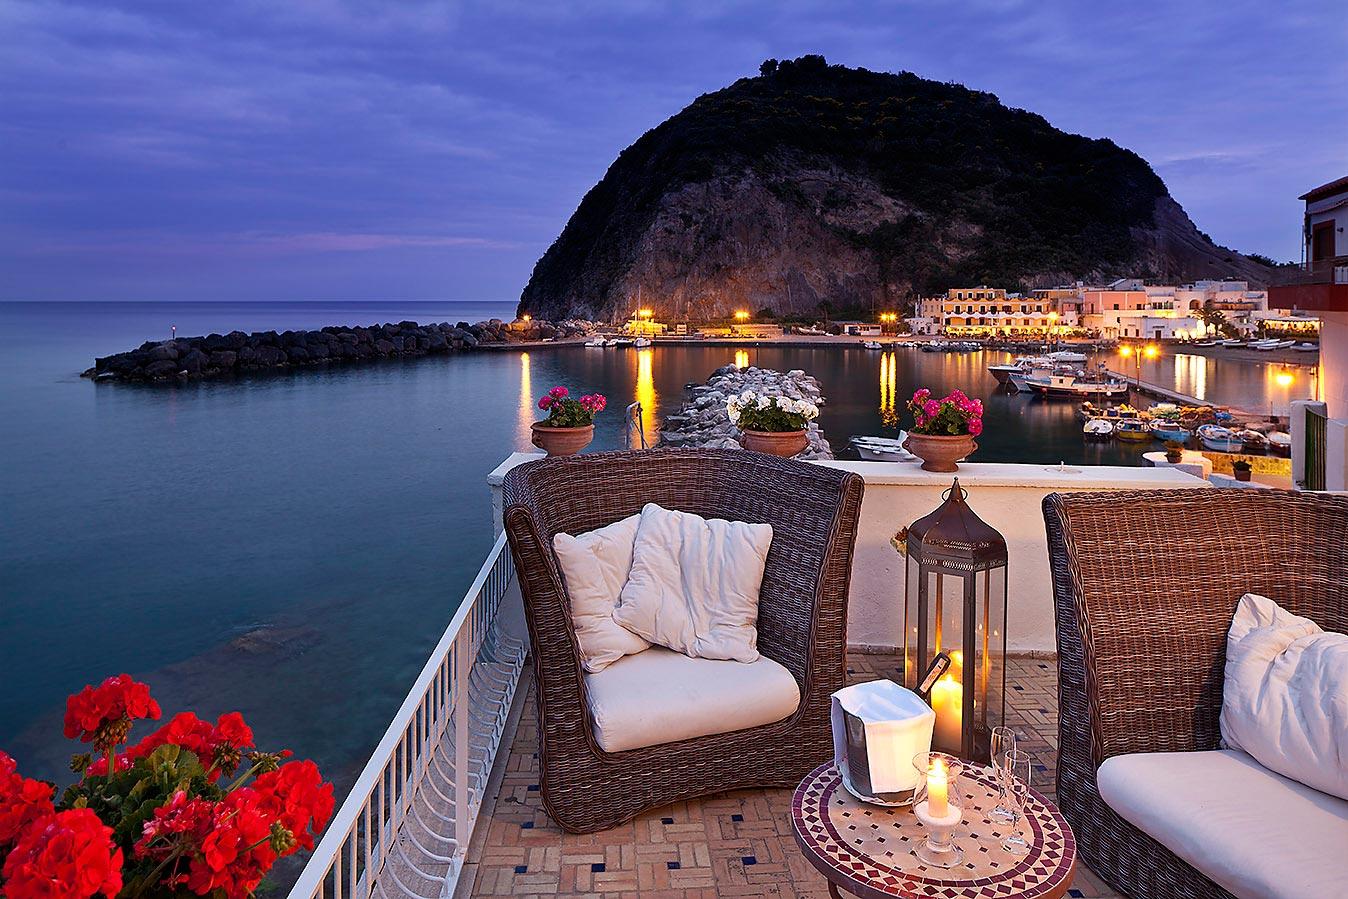 Hotel Miramare auf Ischia